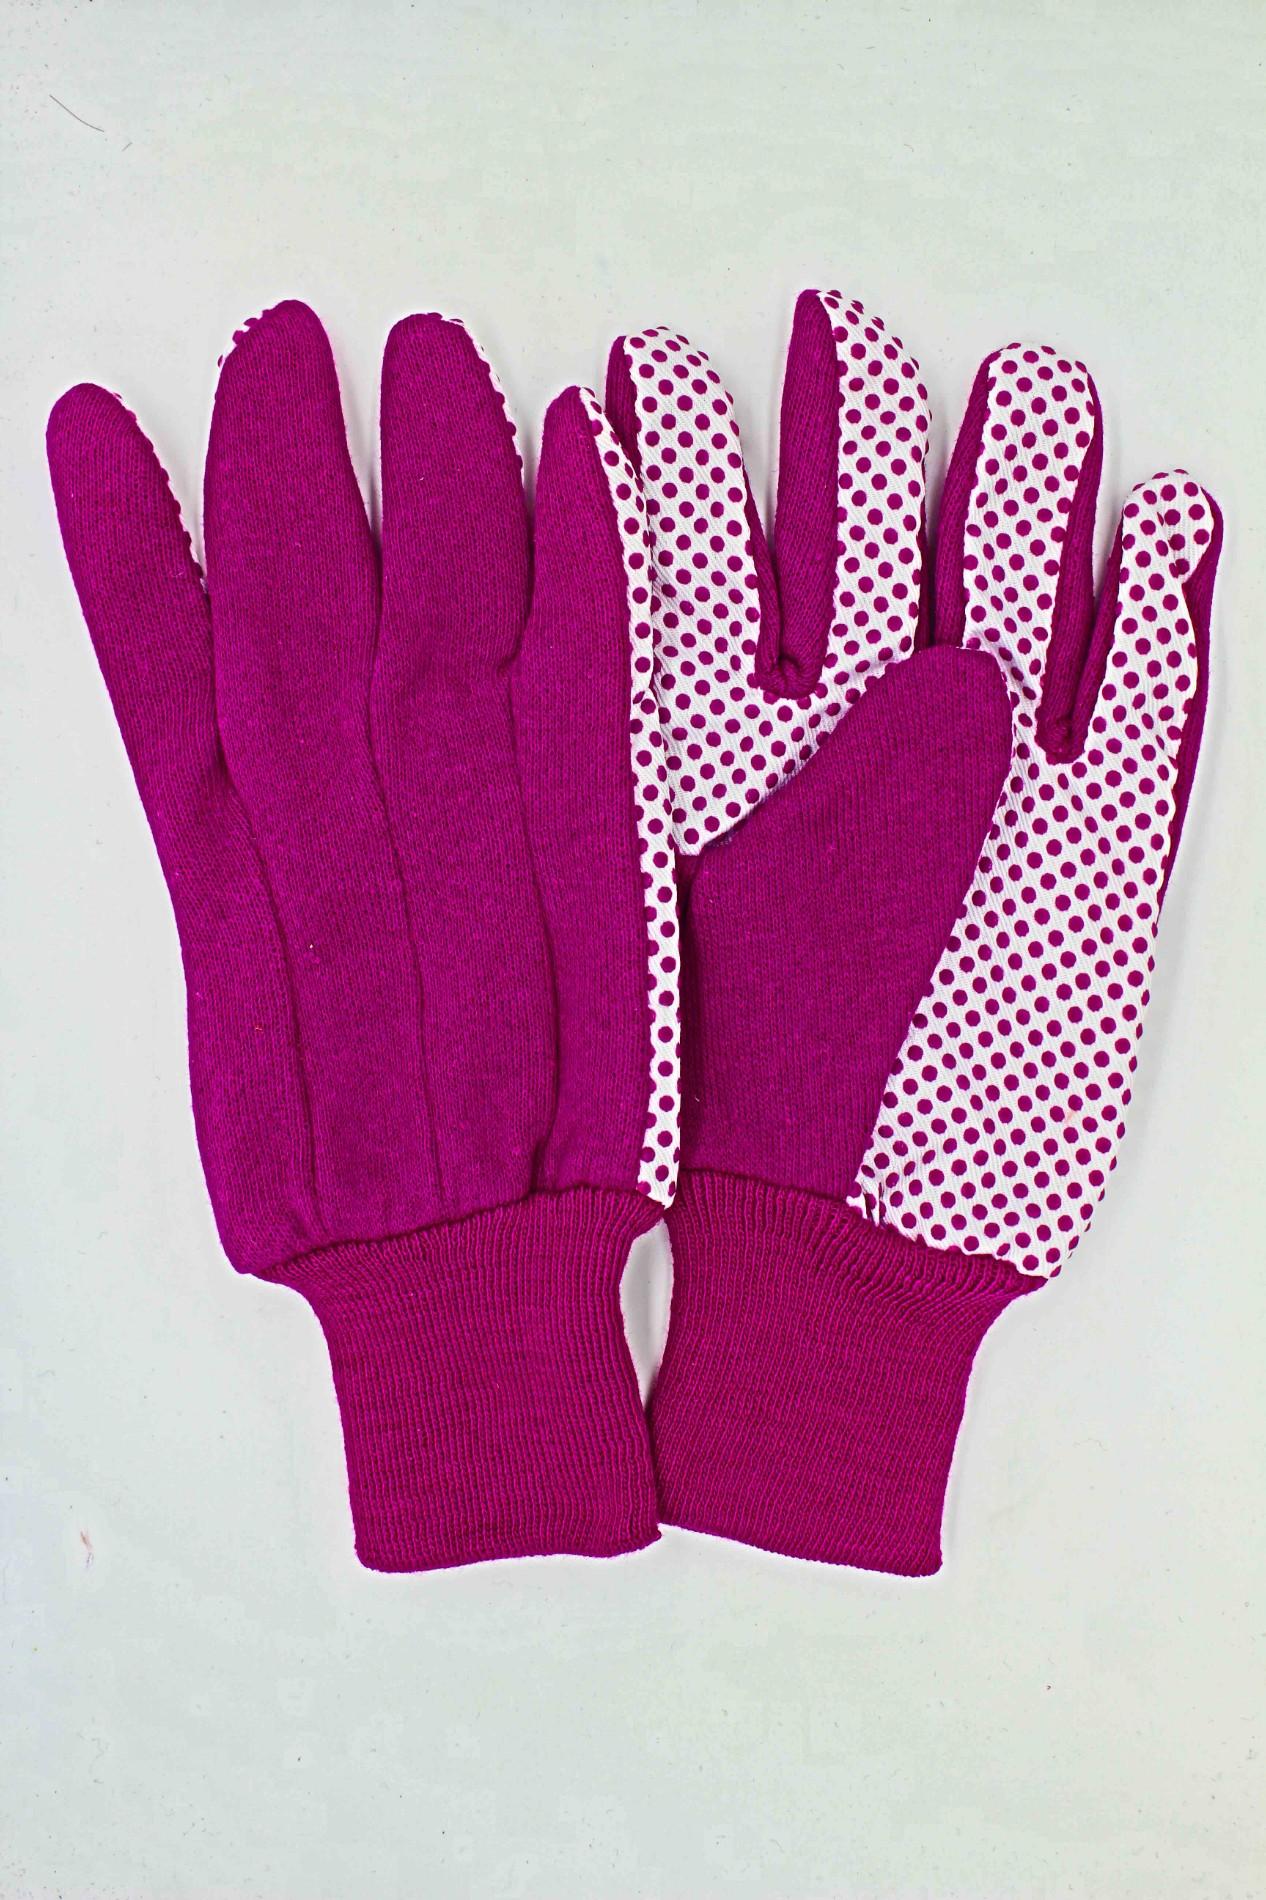 Koop Triple-Color Glove. Triple-Color Glove Prijzen. Triple-Color Glove Brands. Triple-Color Glove Fabrikant. Triple-Color Glove Quotes. Triple-Color Glove Company.